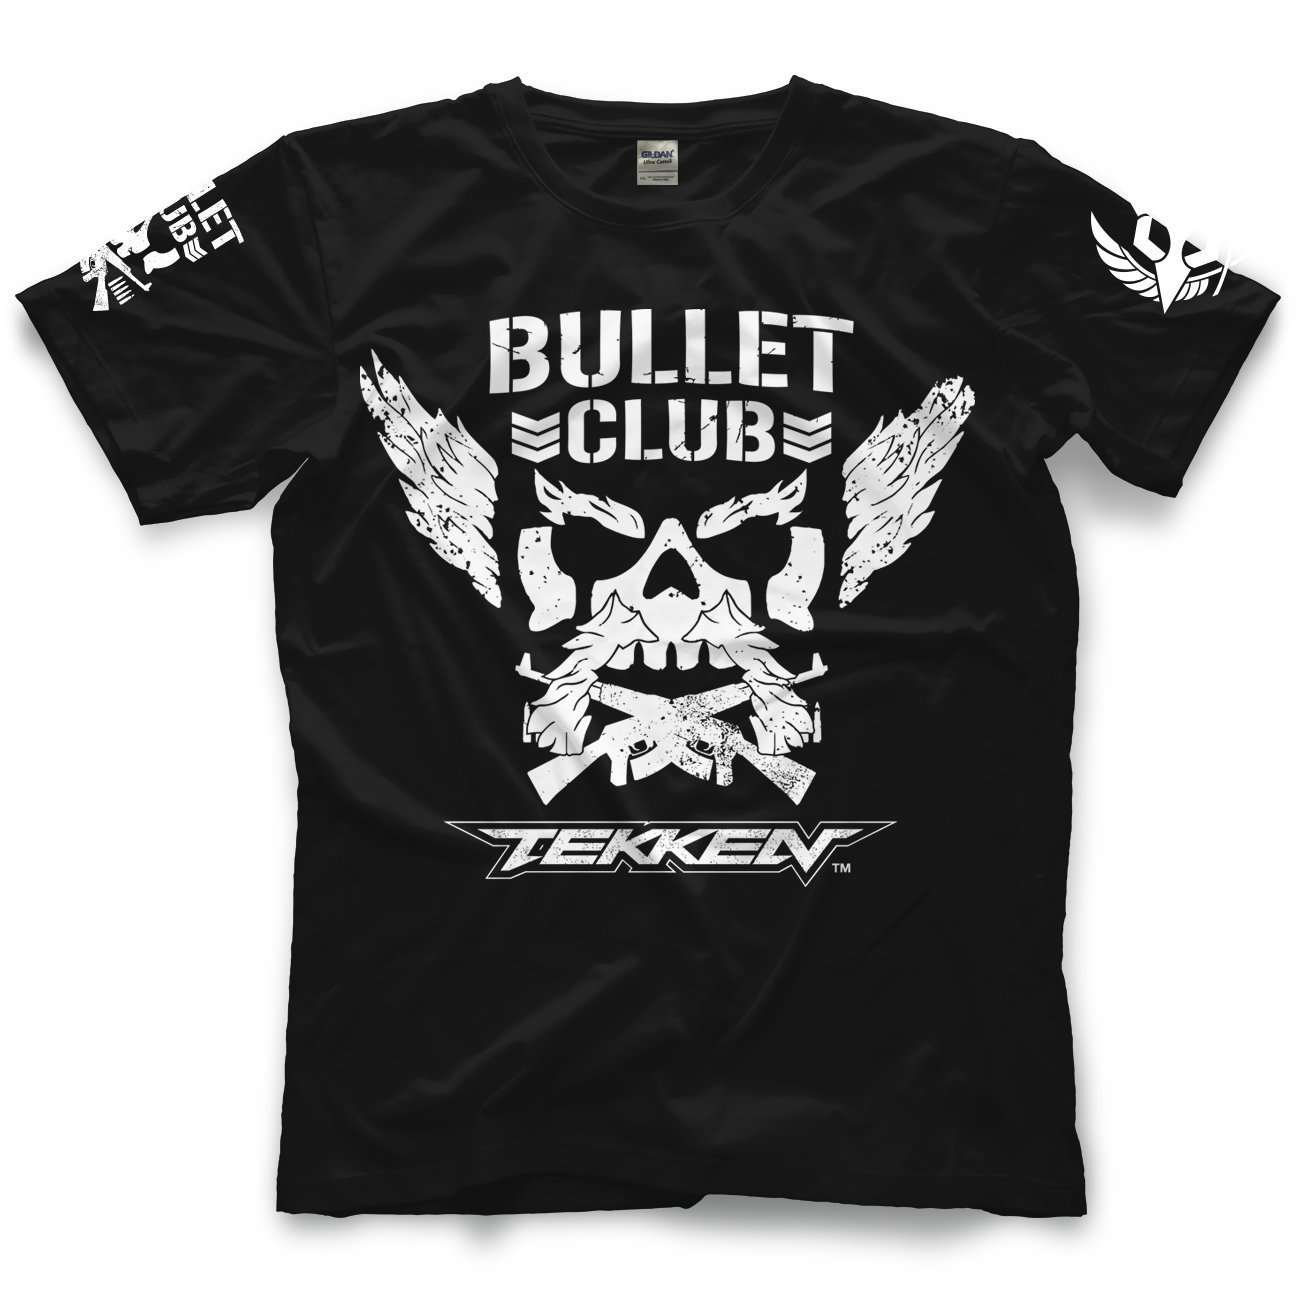 Adult Mens/Unisex New Japan Pro-Wrestling Bullet Club x Tekken Tee - Black by Pro Wrestling Tees